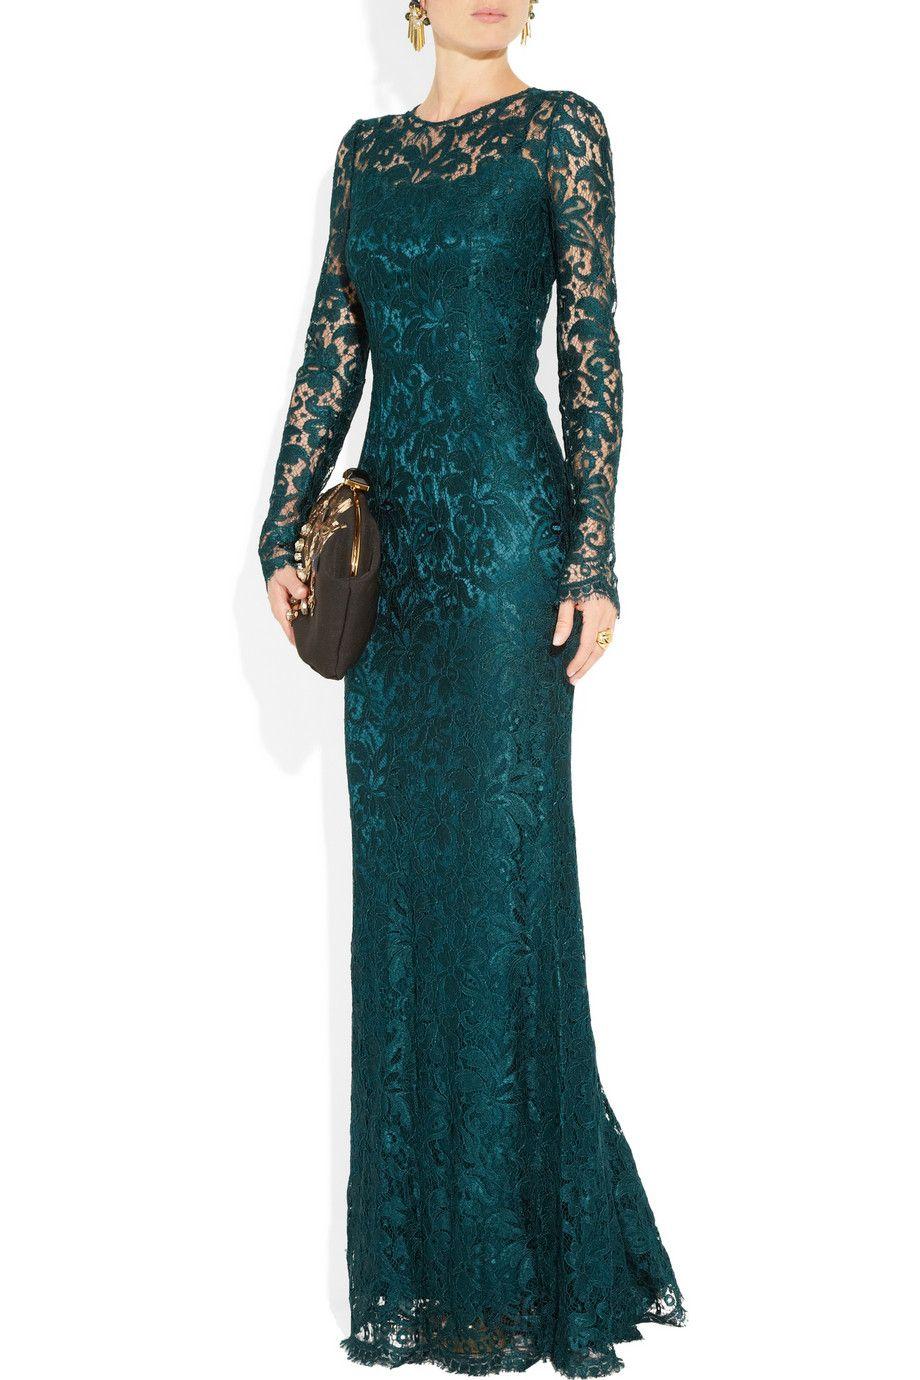 Wedding dress shops in deira dubai  Dolce u Gabbana lace gown  Matrimonio  Pinterest  Gowns Oscar de